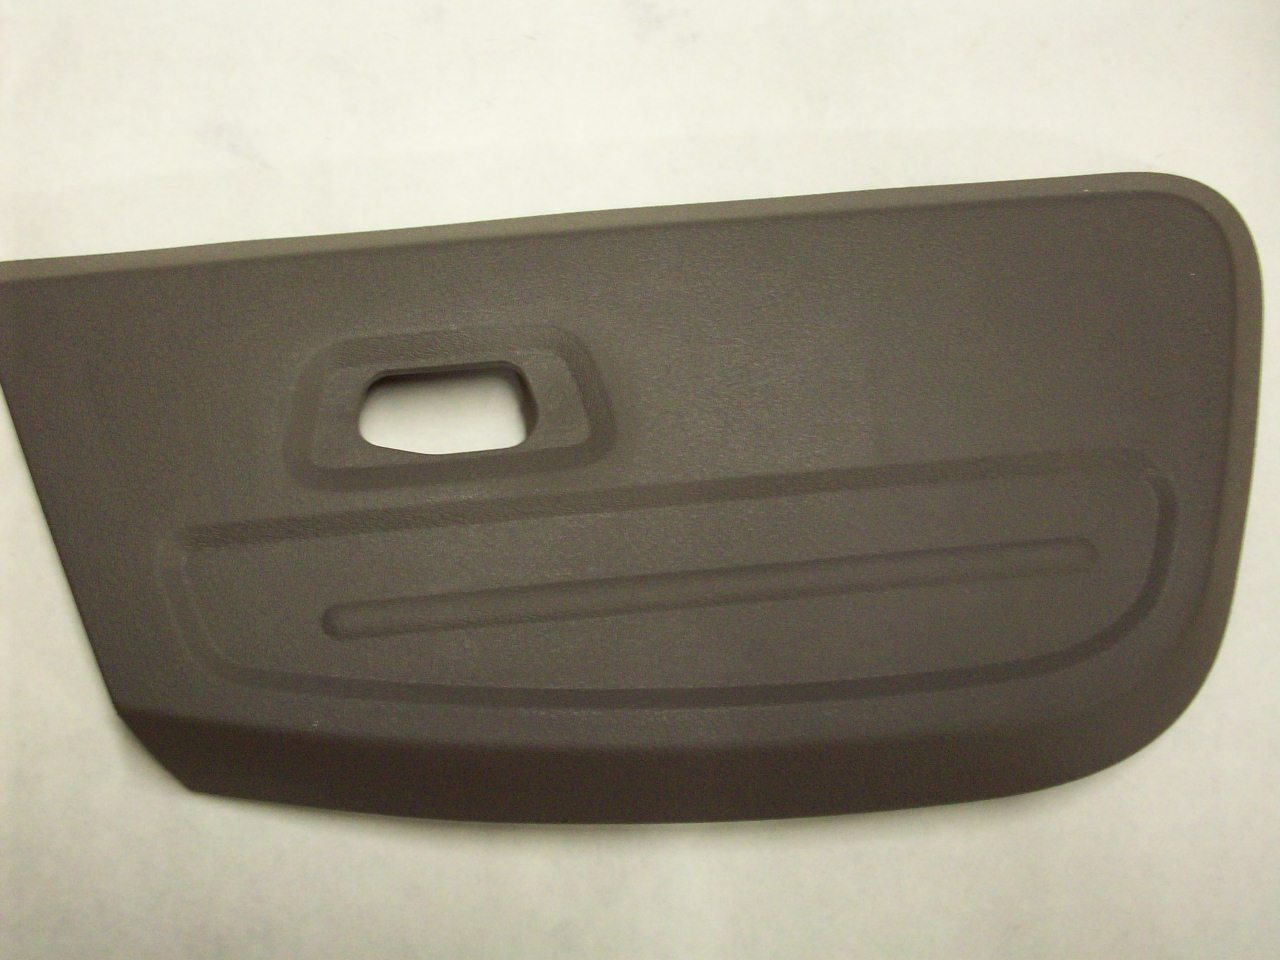 Dodge CHRYSLER OEM 07-09 Nitro Seats Tracks-Front Shield Left 1FY271J8AA